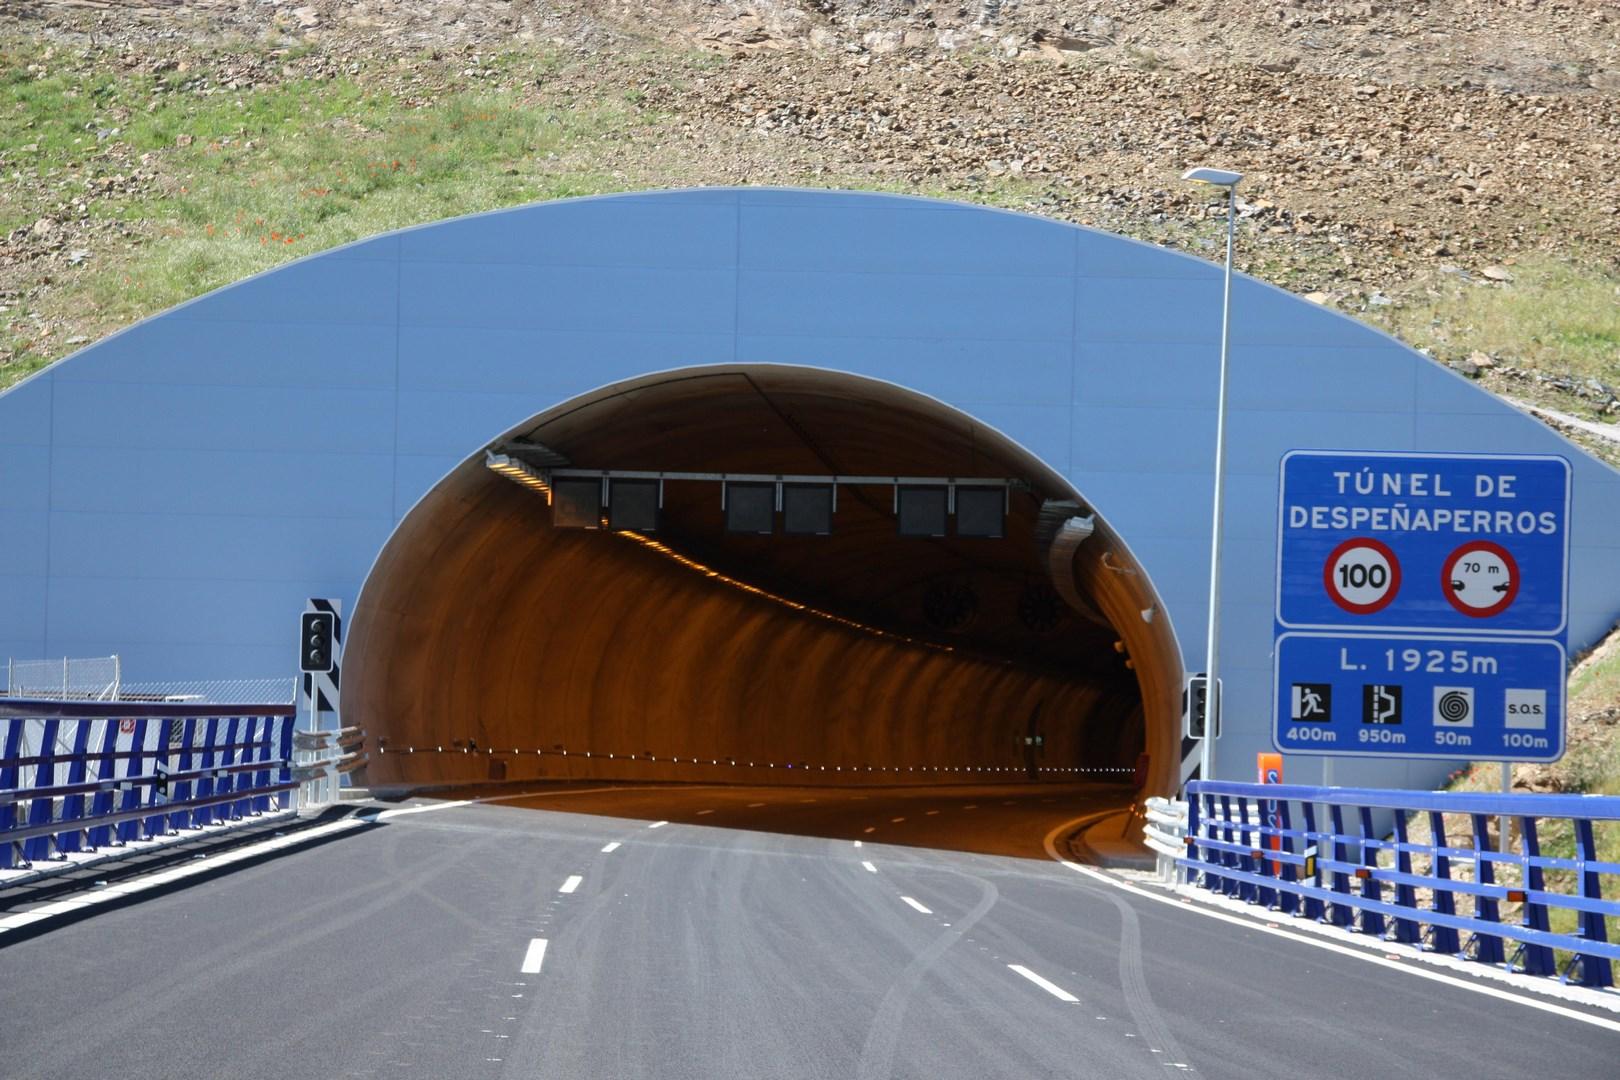 Túnel de Depeñaperros